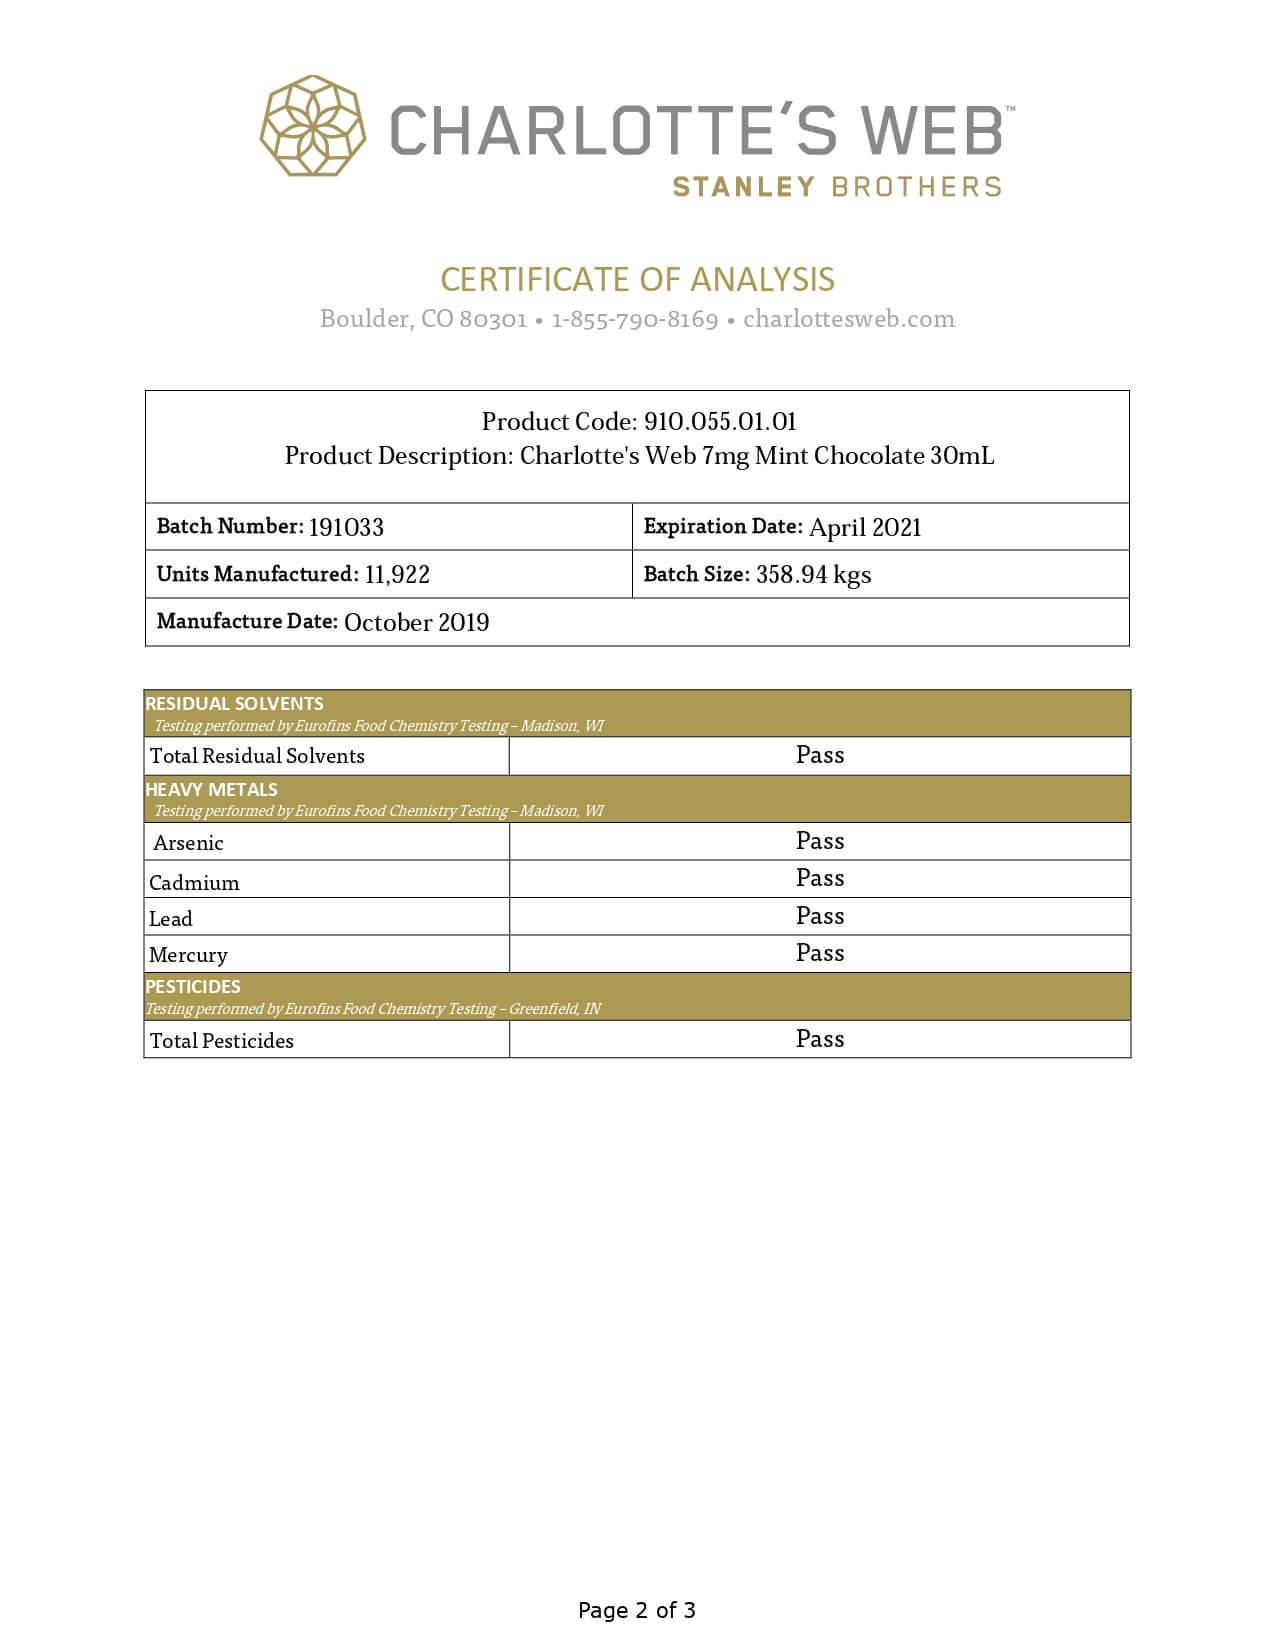 Charlottes Web Full Spectrum Mint Chocolate 7mg 1ml Lab Report